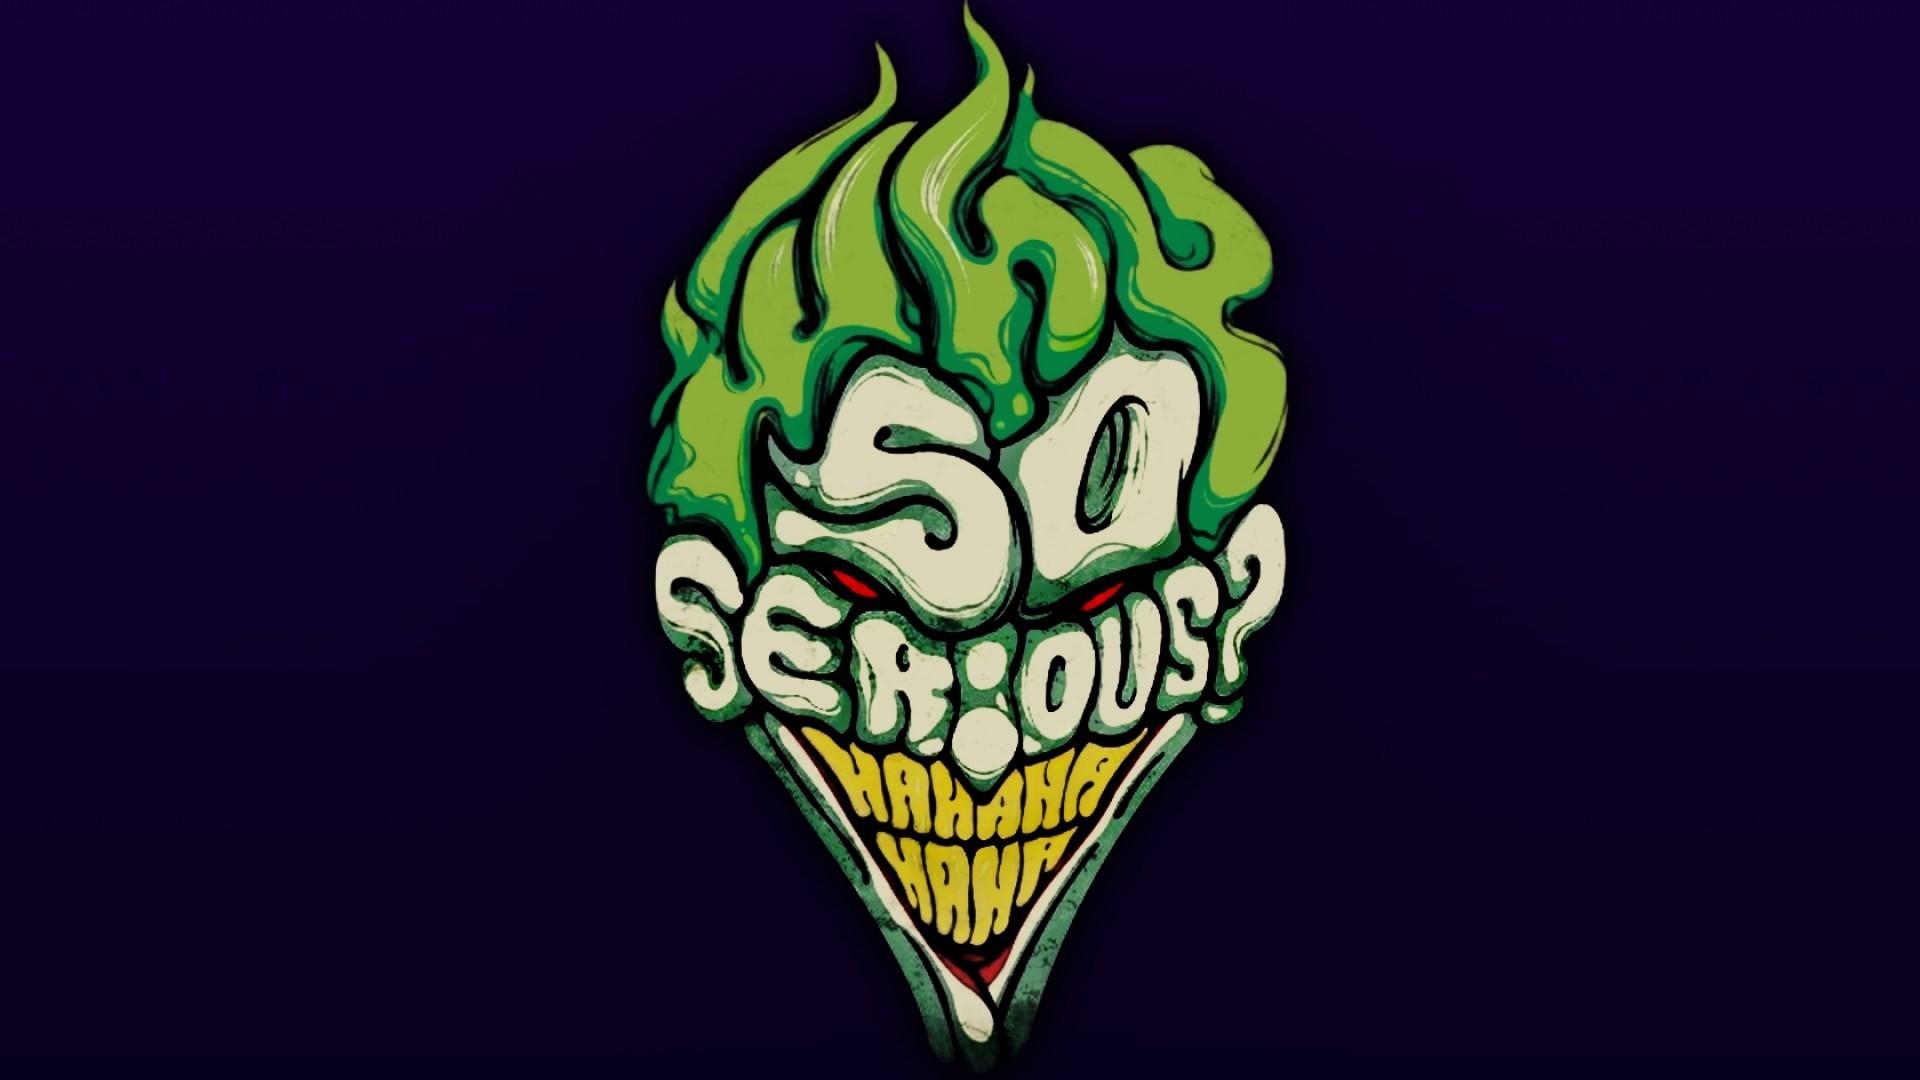 joker harley quinn wallpaper hd download free | ololoshenka | Pinterest |  Harley quinn, Joker and Wallpaper